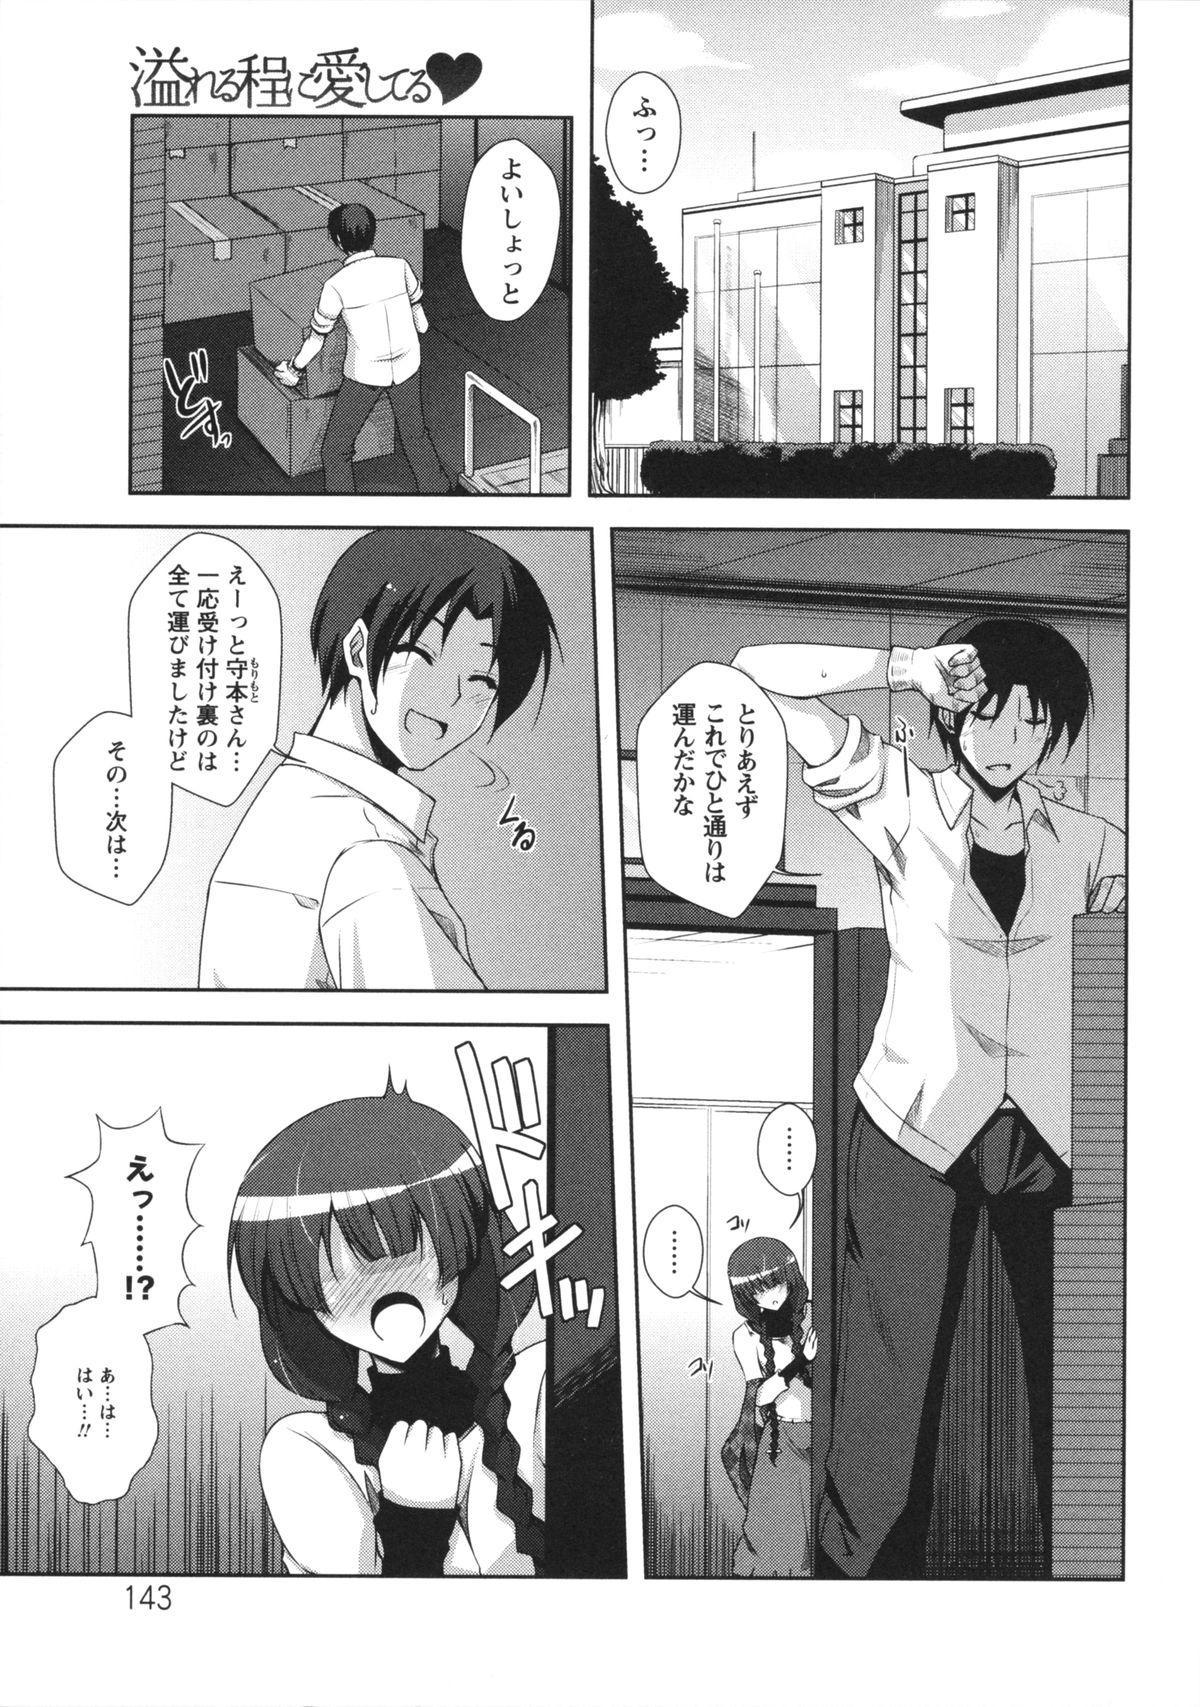 Binkan Niku Kanojyo 142